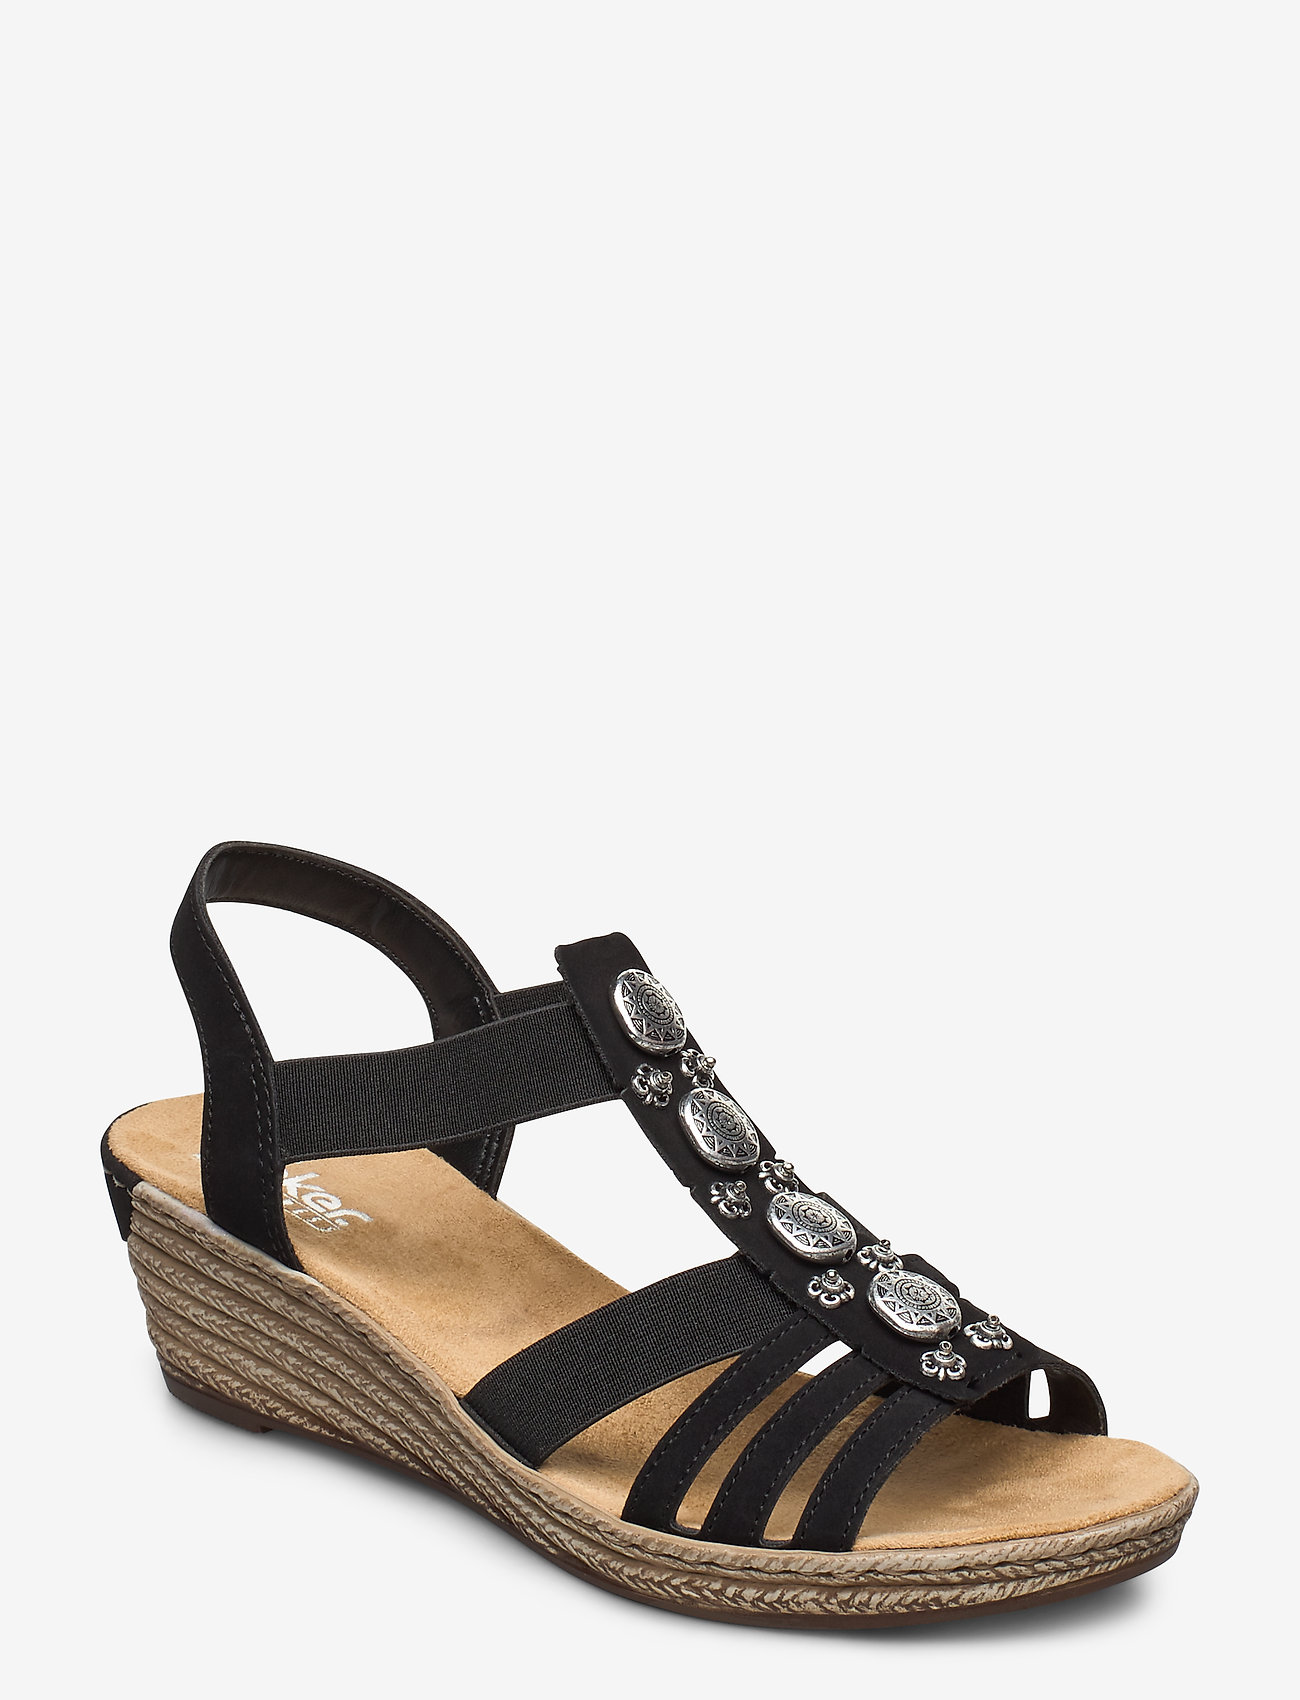 Rieker - 624B4-00 - heeled espadrilles - black